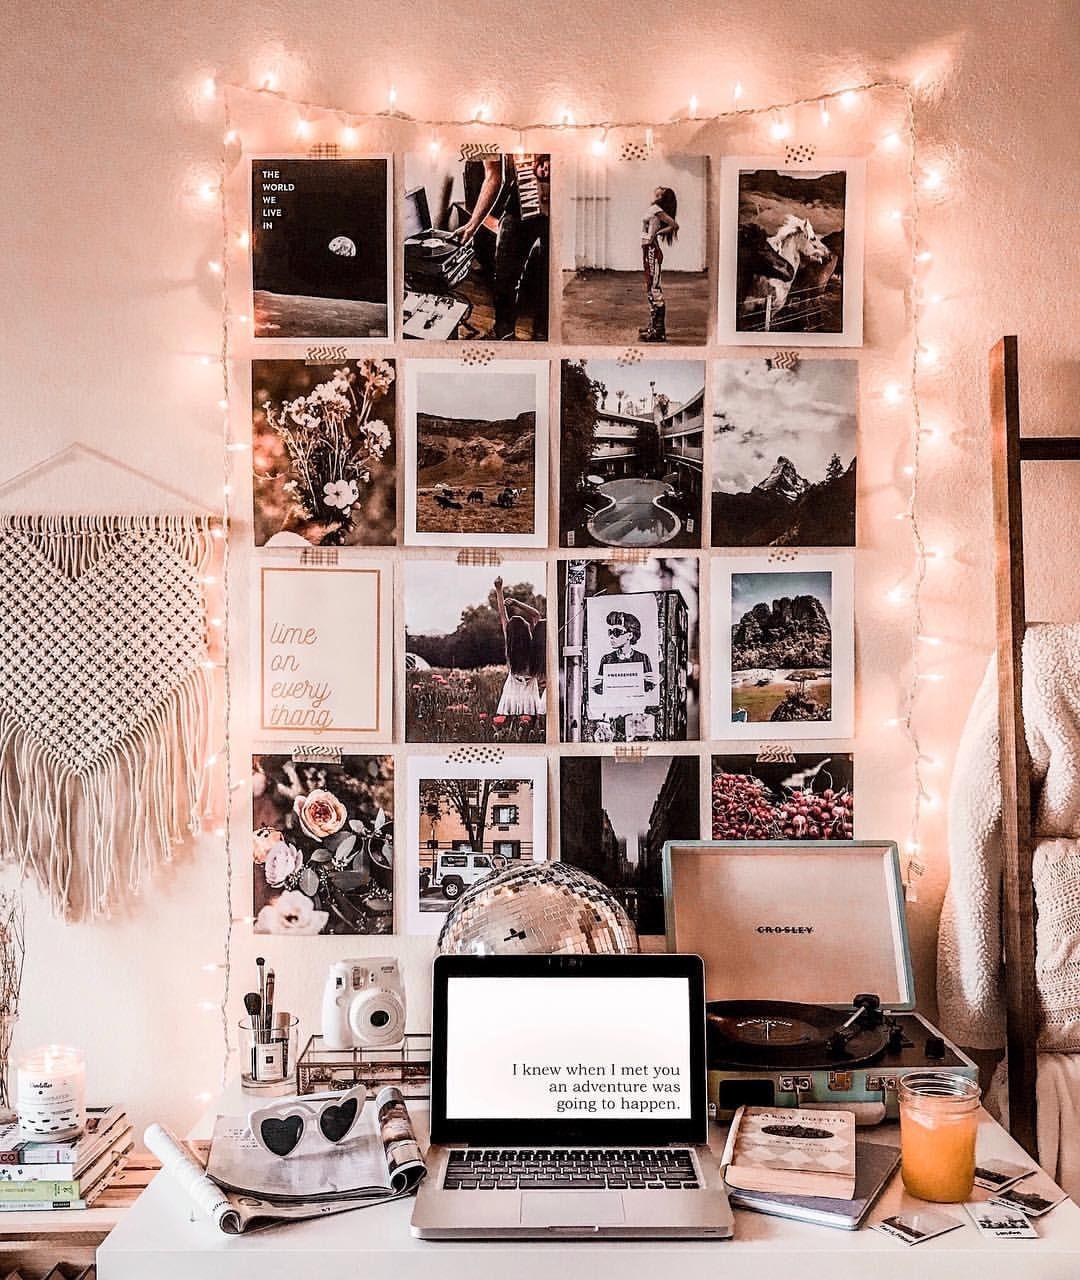 Home Deskdecor Ideas: Collage Gallery Wall @astoldbymichelle #deskideas